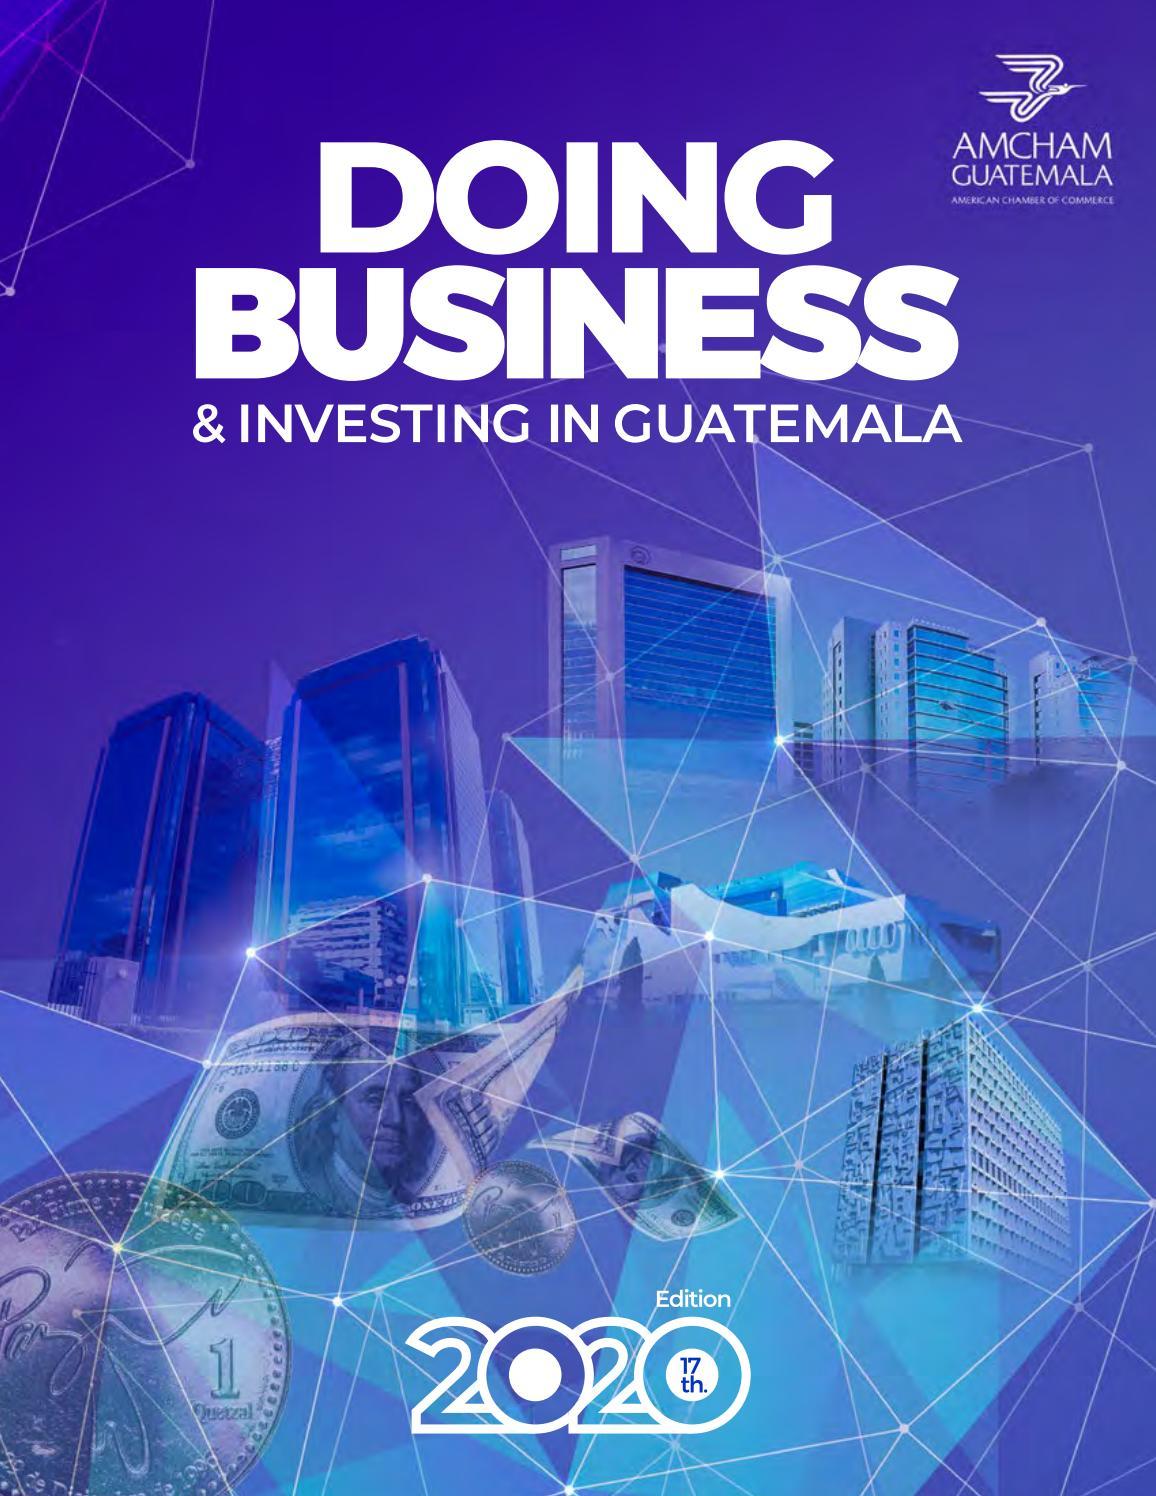 Doing Business 2020 By Amcham Guatemala Issuu